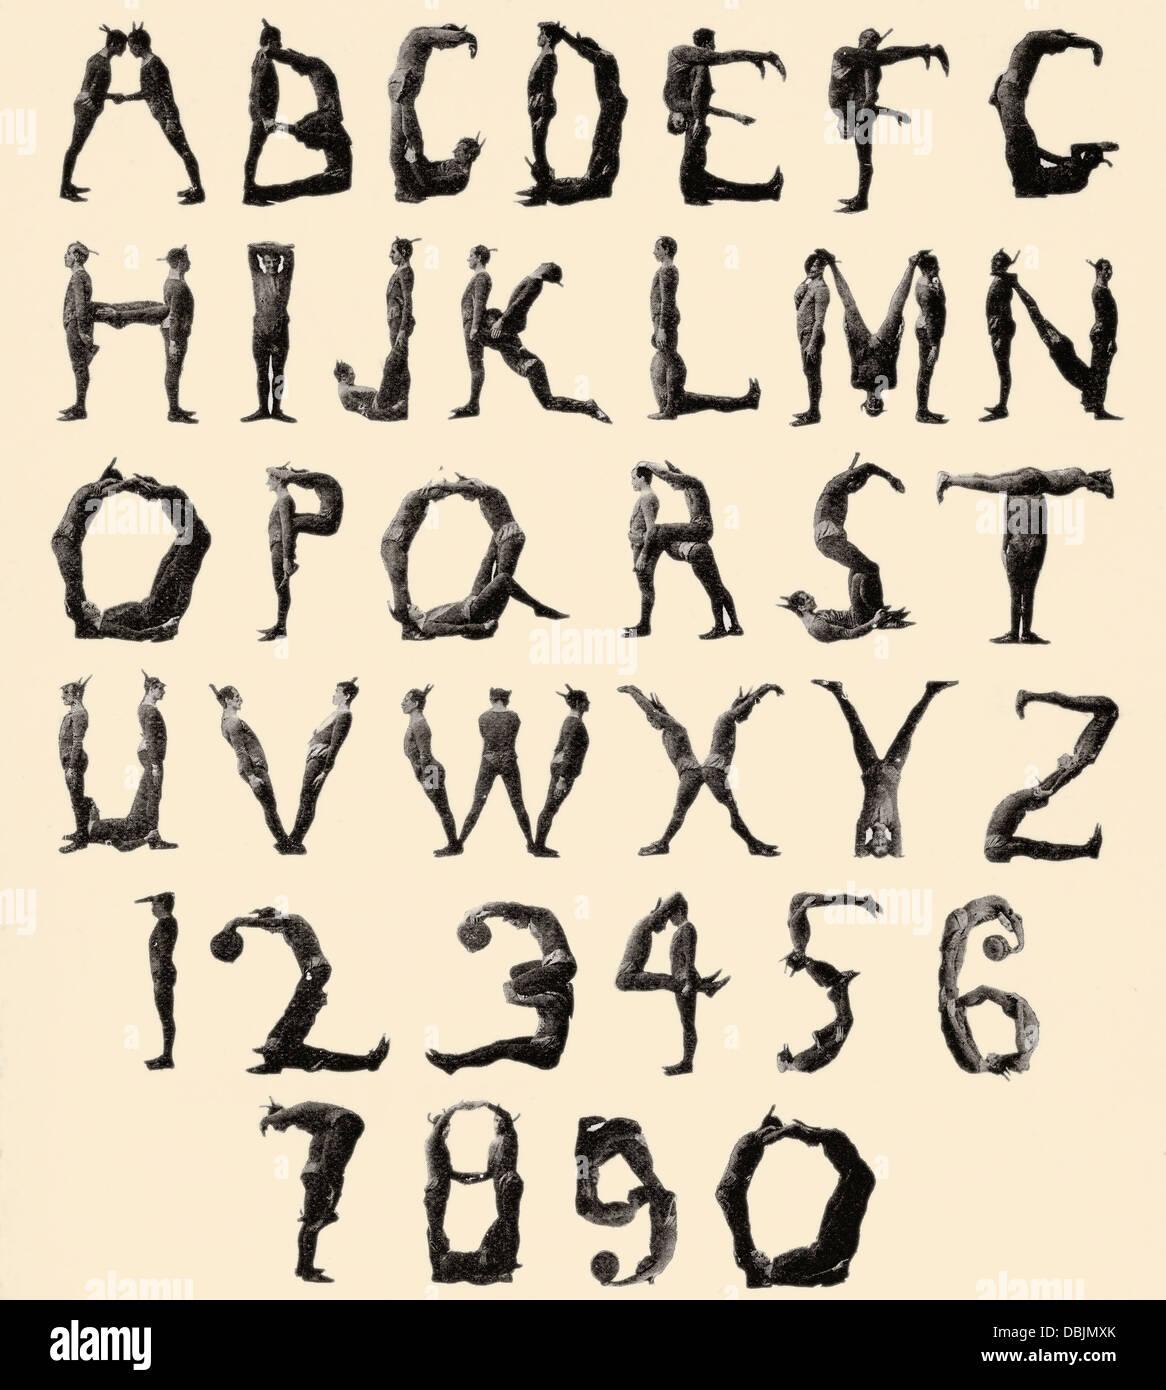 The three delevines satanic gambols human alphabet the three the three delevines satanic gambols human alphabet the three delevines were an 1897 music hall act biocorpaavc